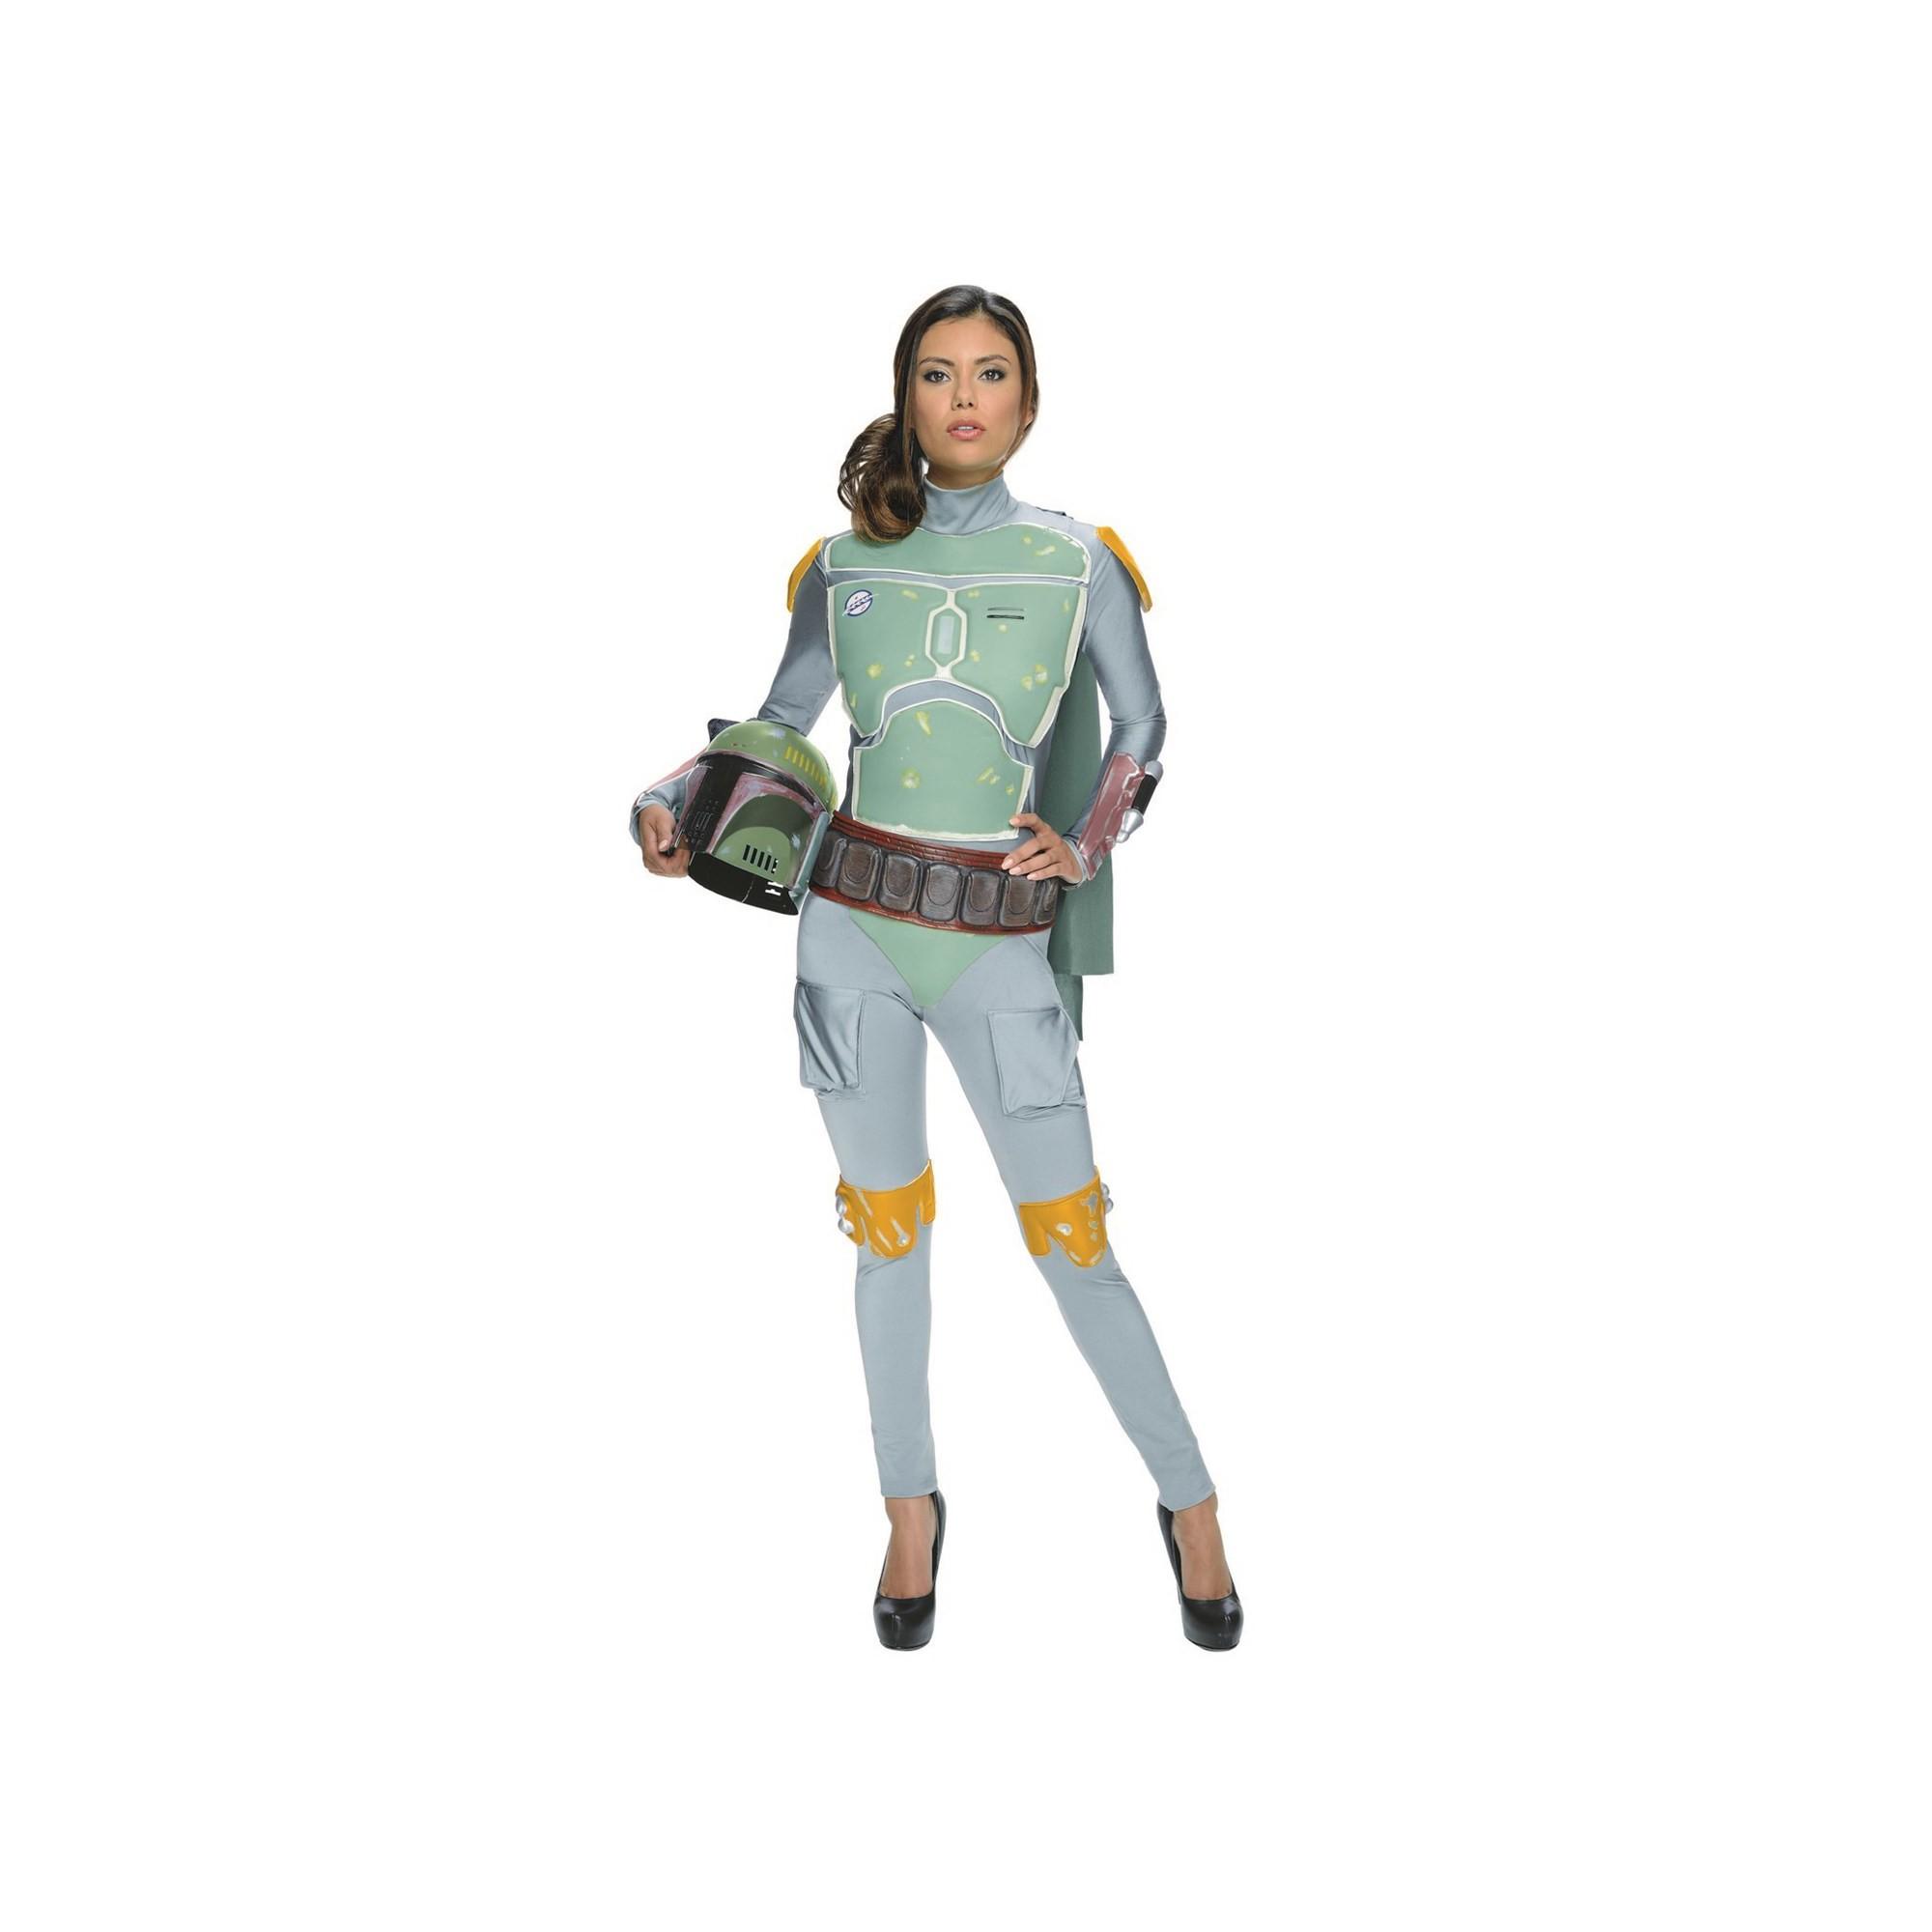 Women's Star Wars Boba Fett Halloween Costume S, Multicolored